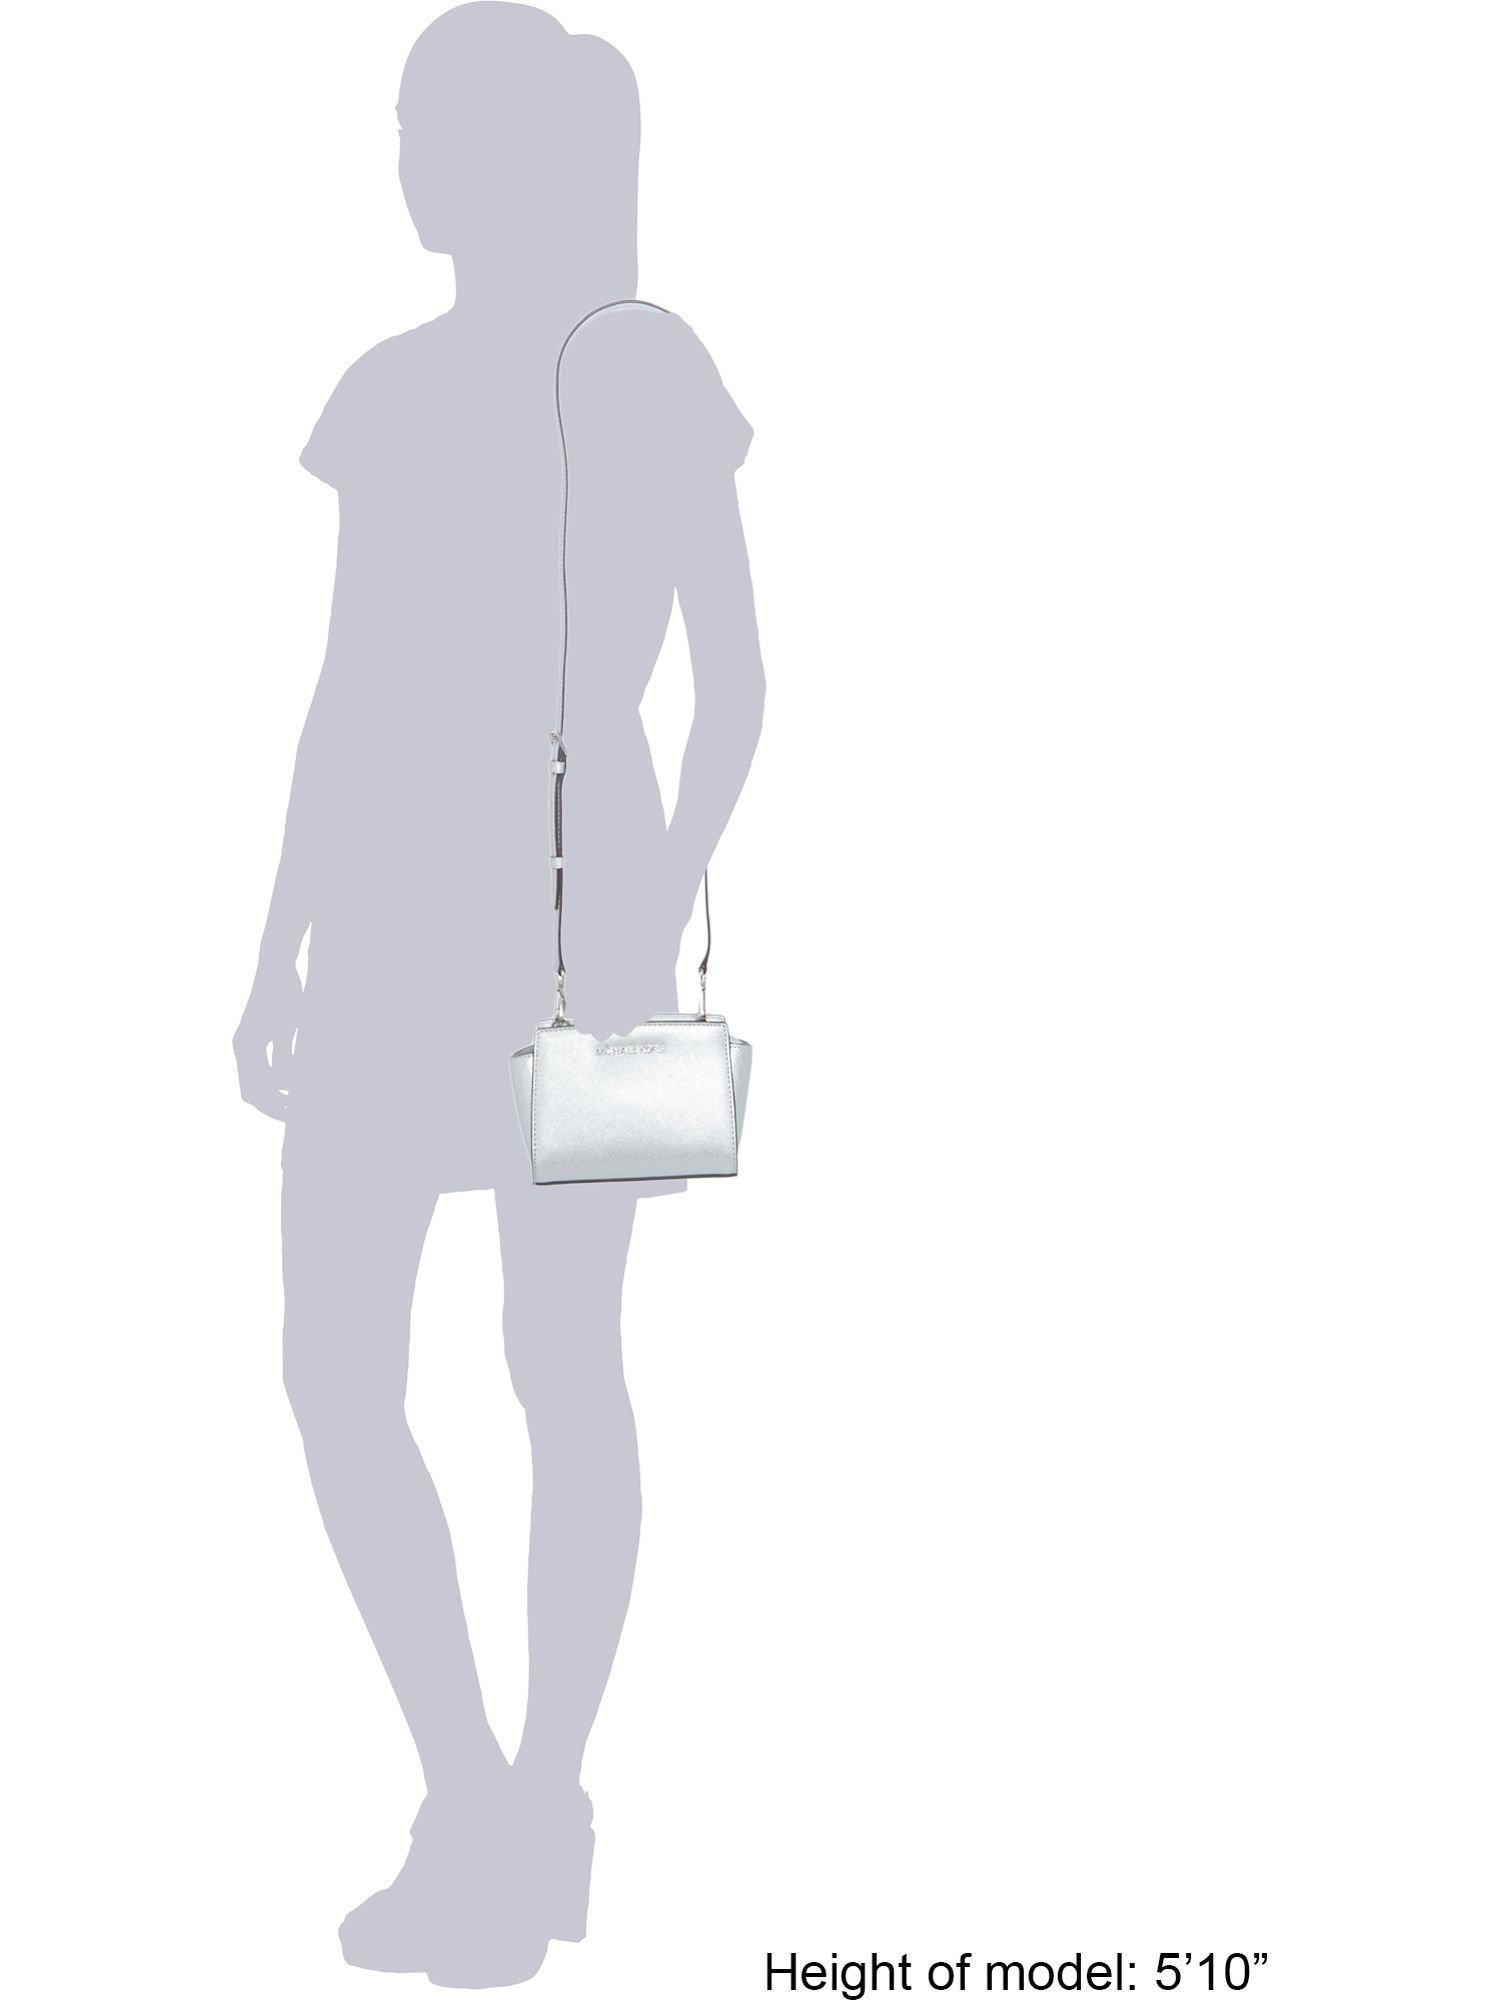 Michael Kors Selma Silver Mini Cross Body Bag in Metallic